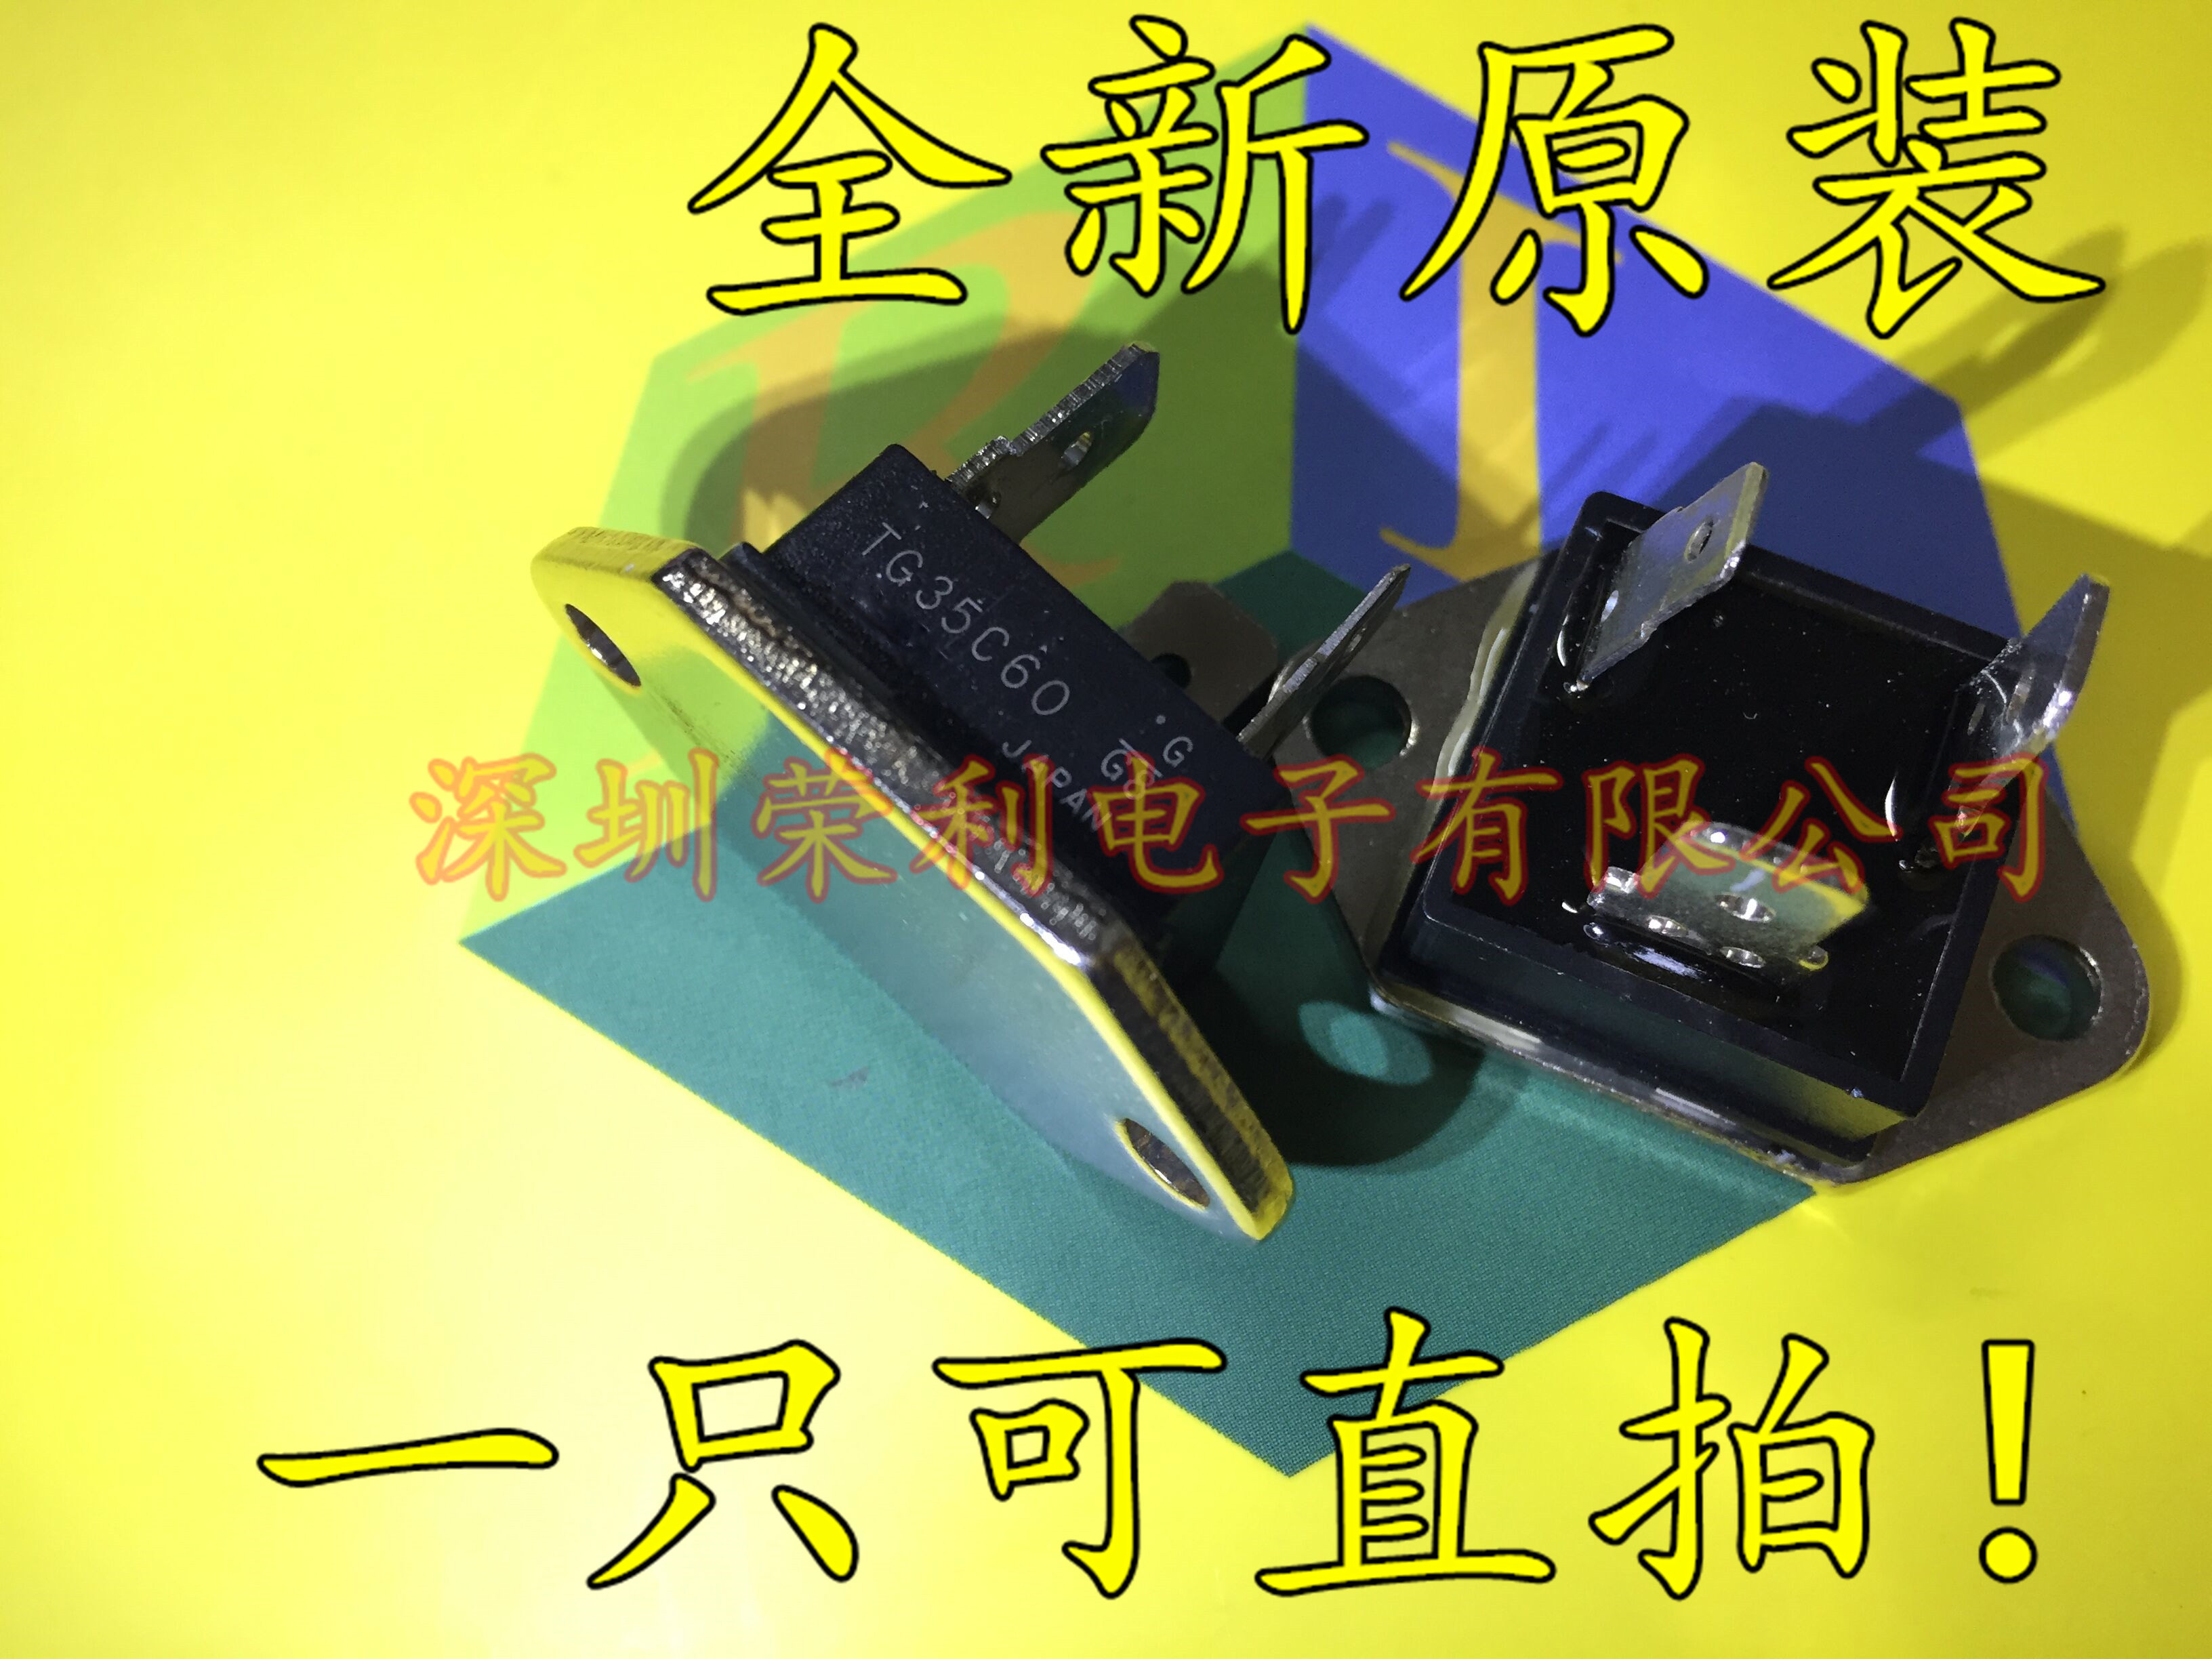 Free shipping 10pcs/lot TG35C60 triac 35A, 600V MU-241 DIP new original